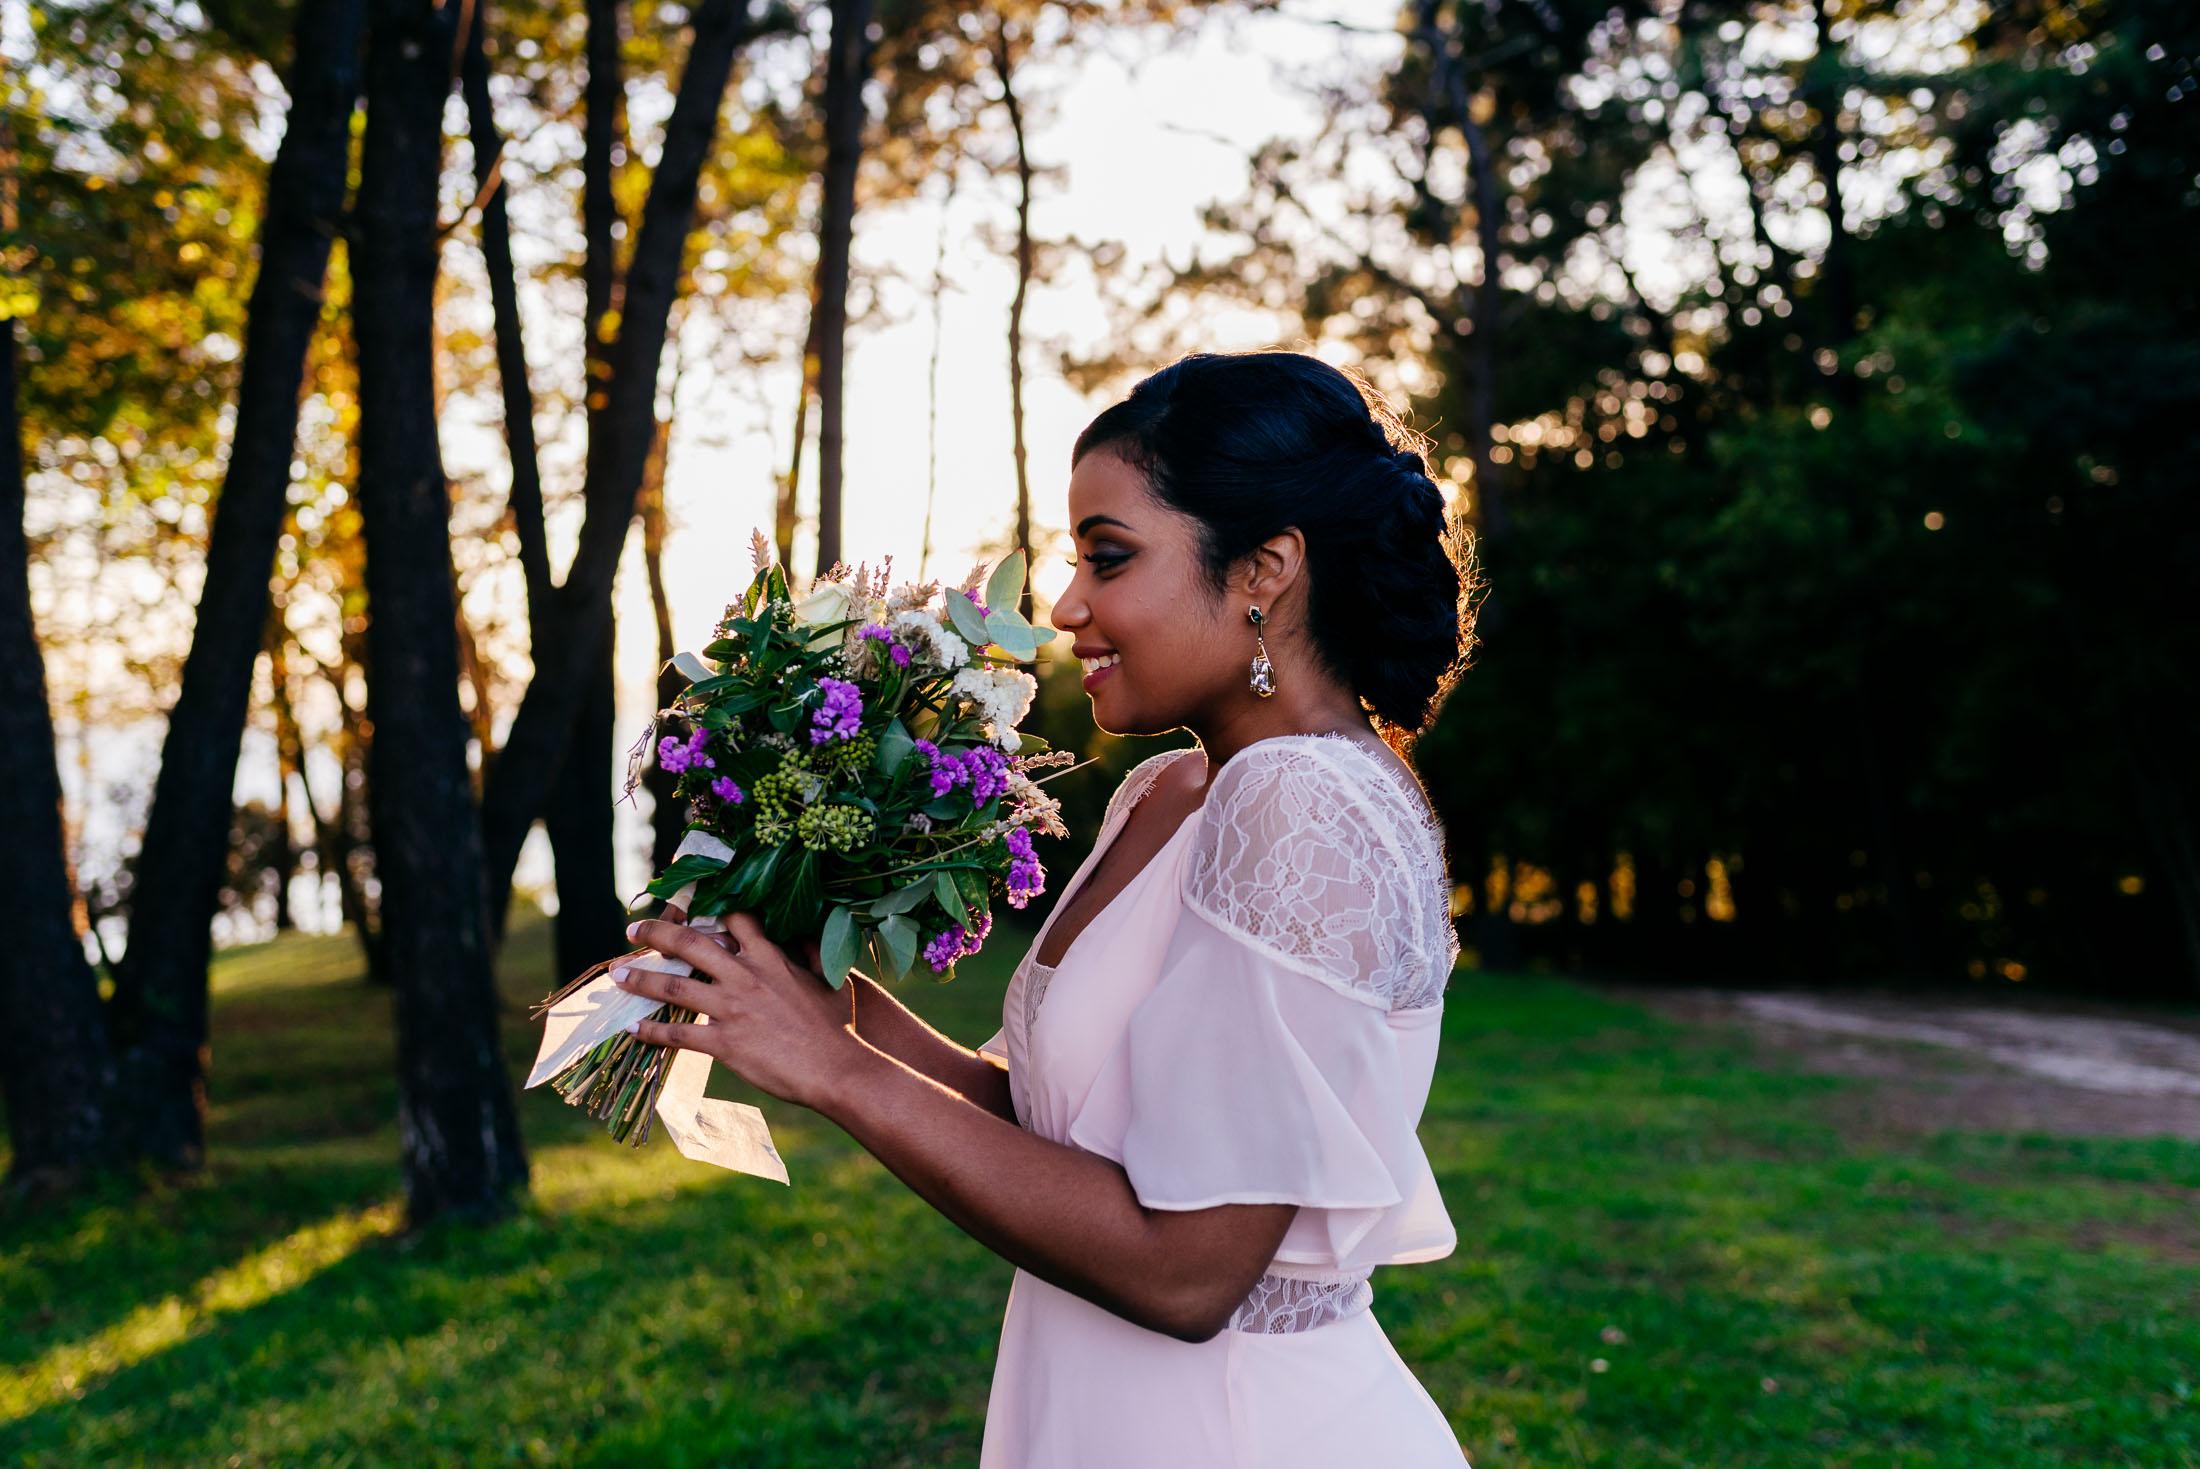 Consejos para elegir al fotógrafo de tu boda.